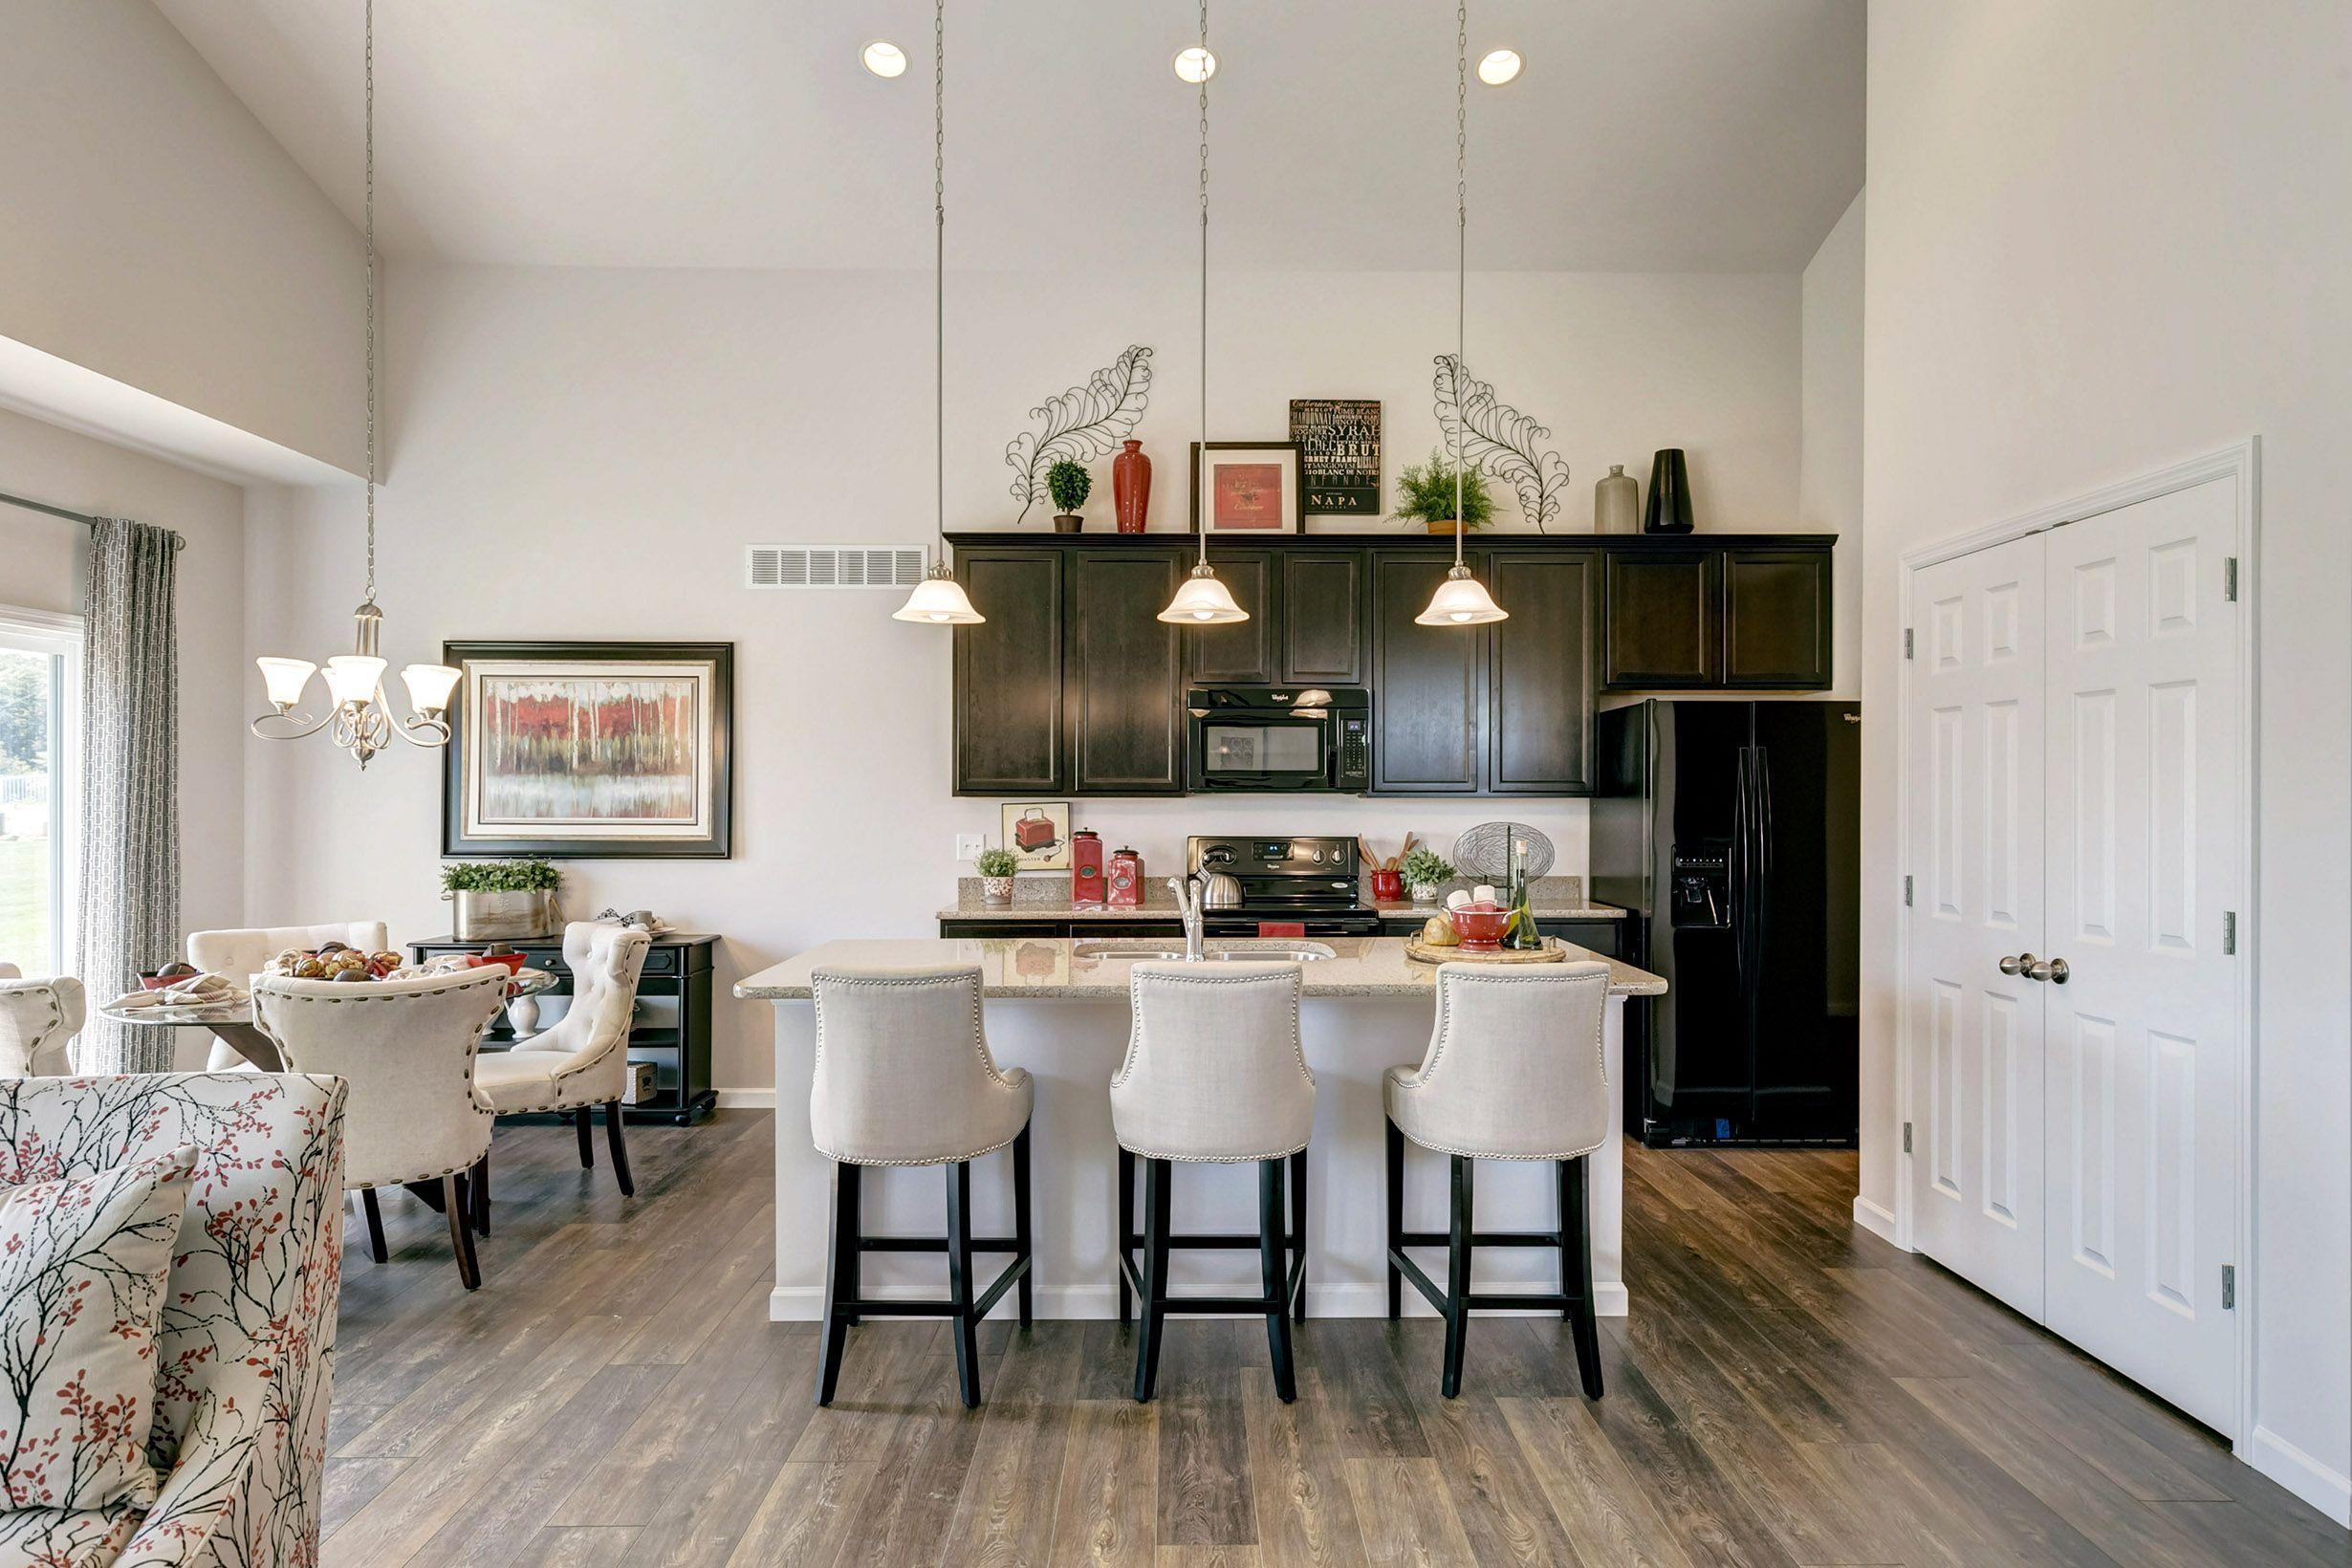 'Carlton Glen' by Consort Homes in St. Louis